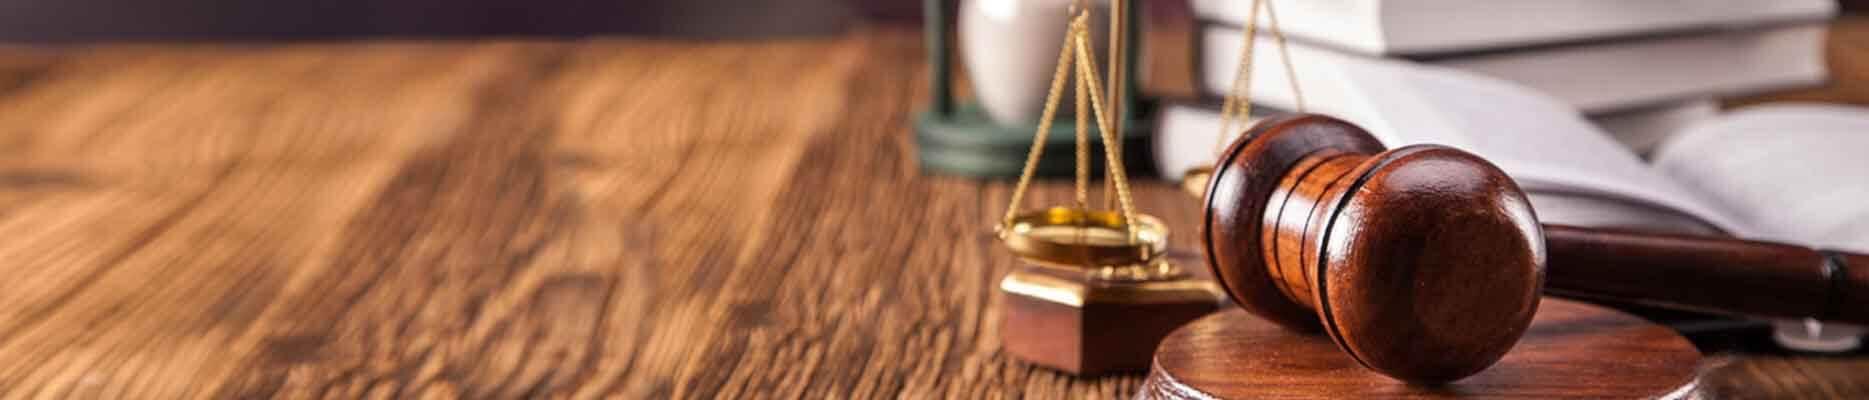 Правила подсудности исков